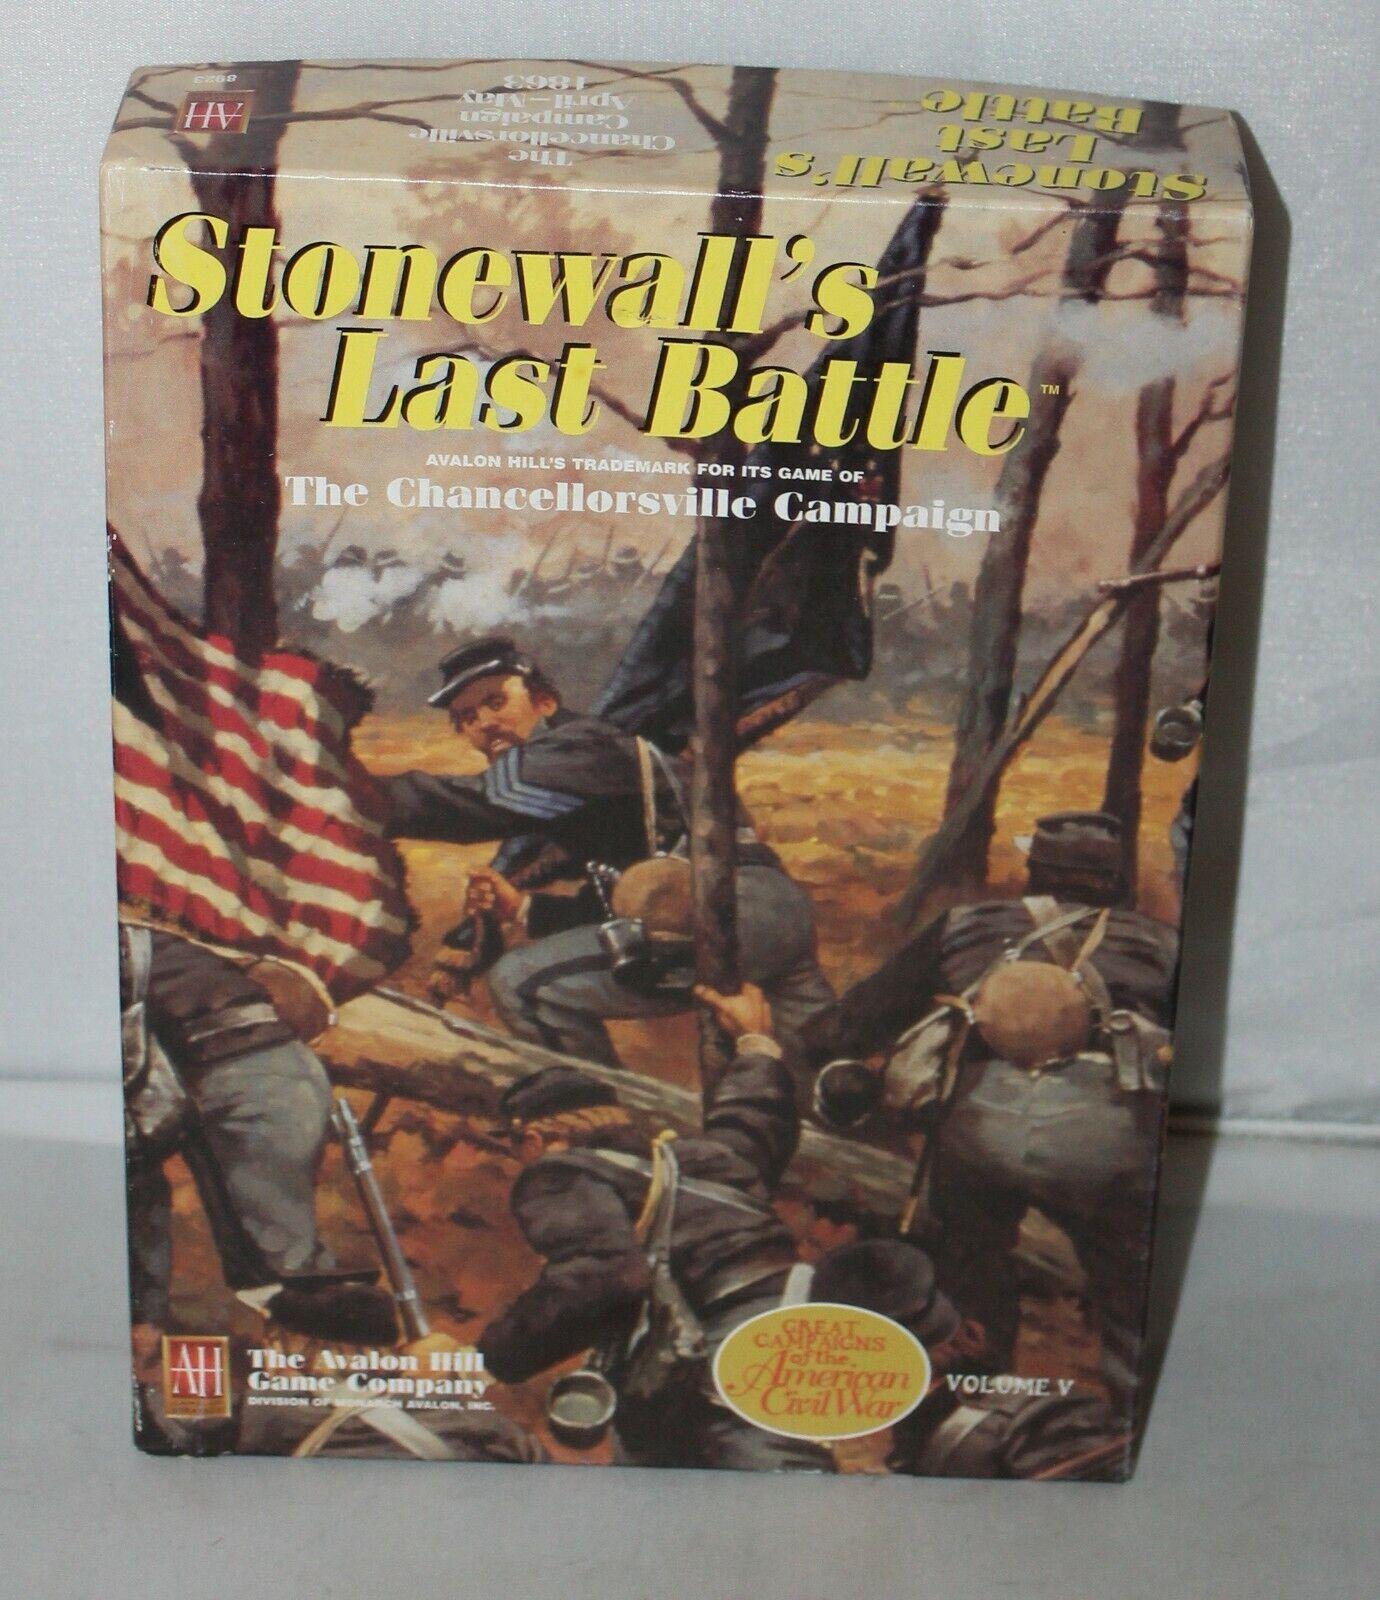 AH Avalon Hill GBACW Vol 5  Stonewall's Last Battle  Chancellorsville Campaign